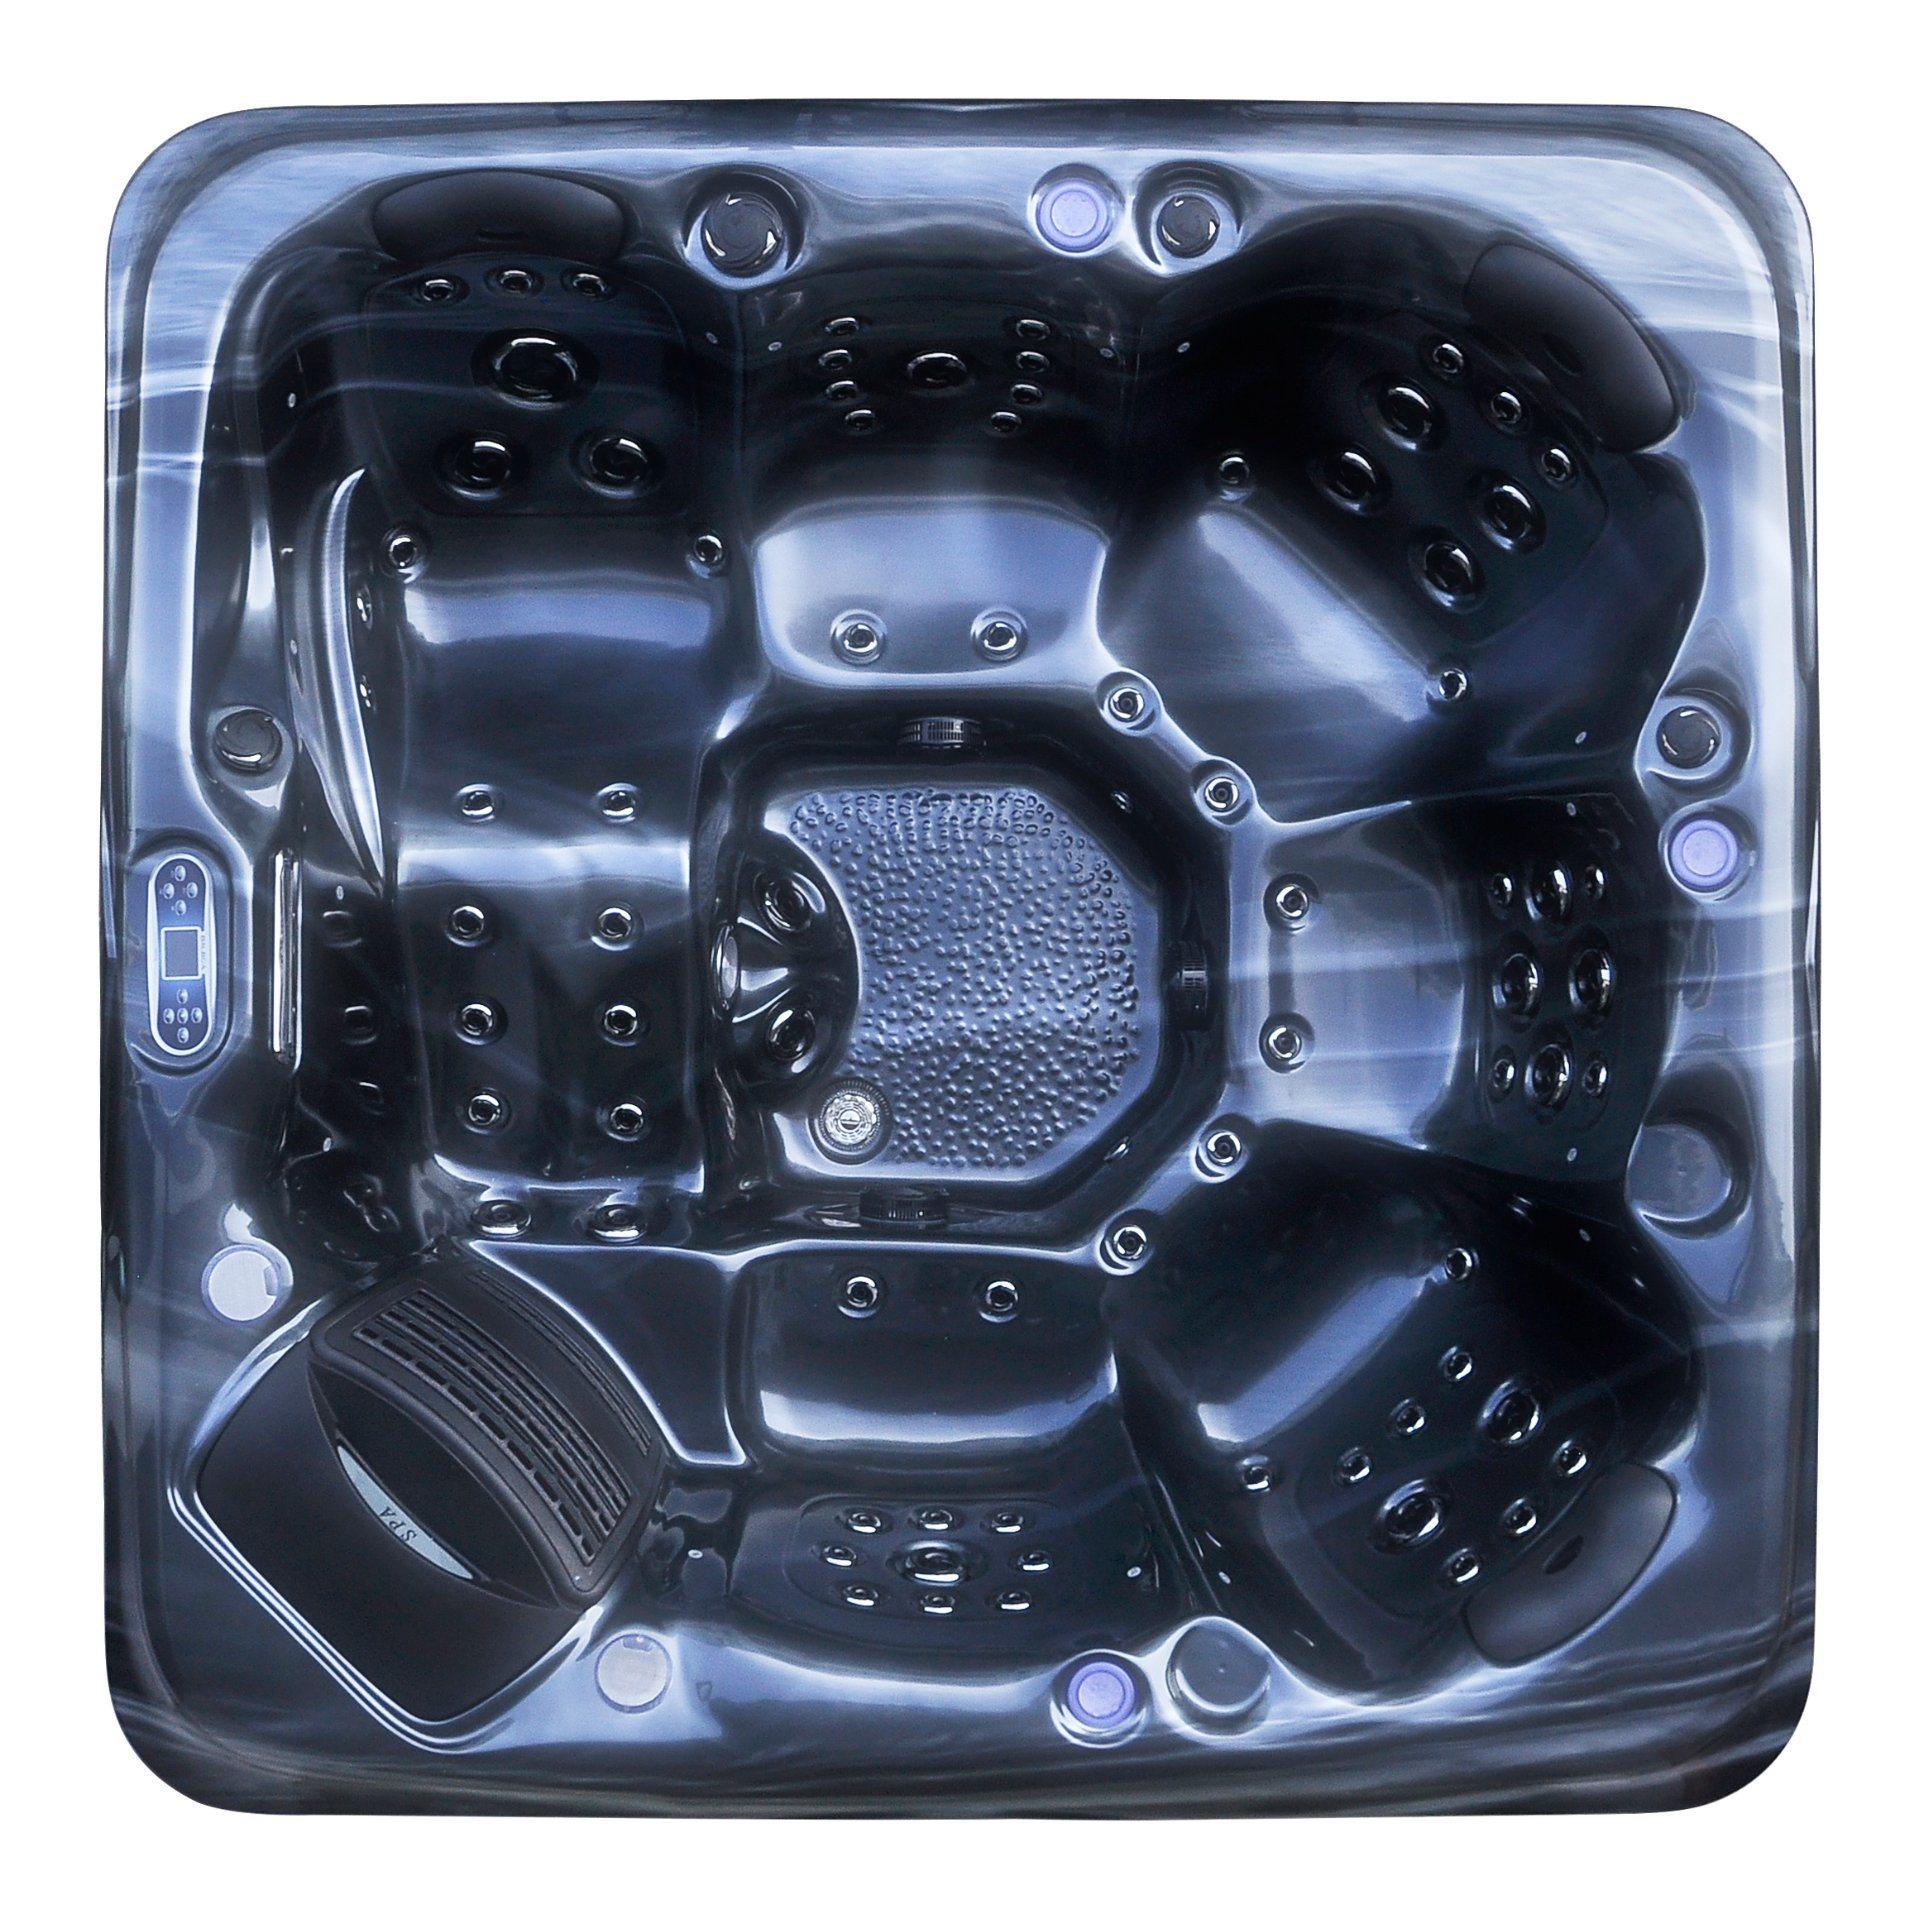 China Kingston Foot Whirlpool 6 Person Bathtub for Shower Massage ...